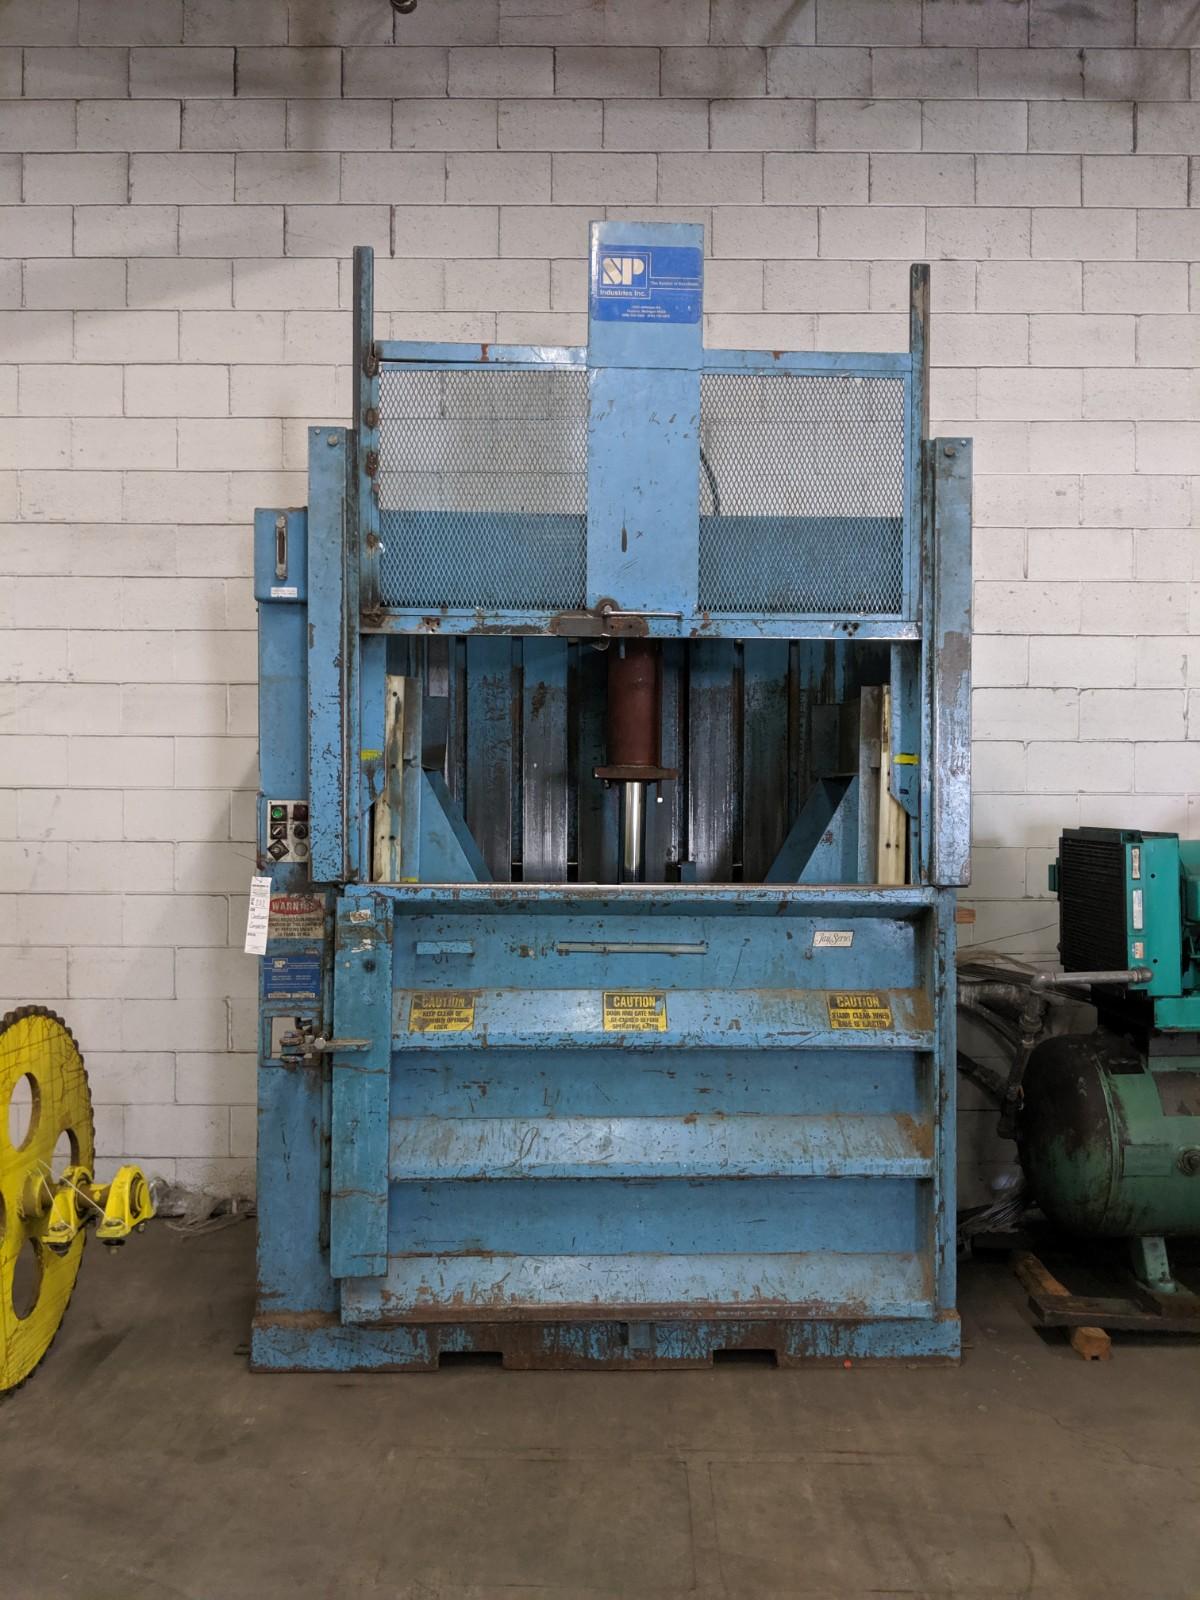 Lot 202 - SP Industries Cardboard Baler